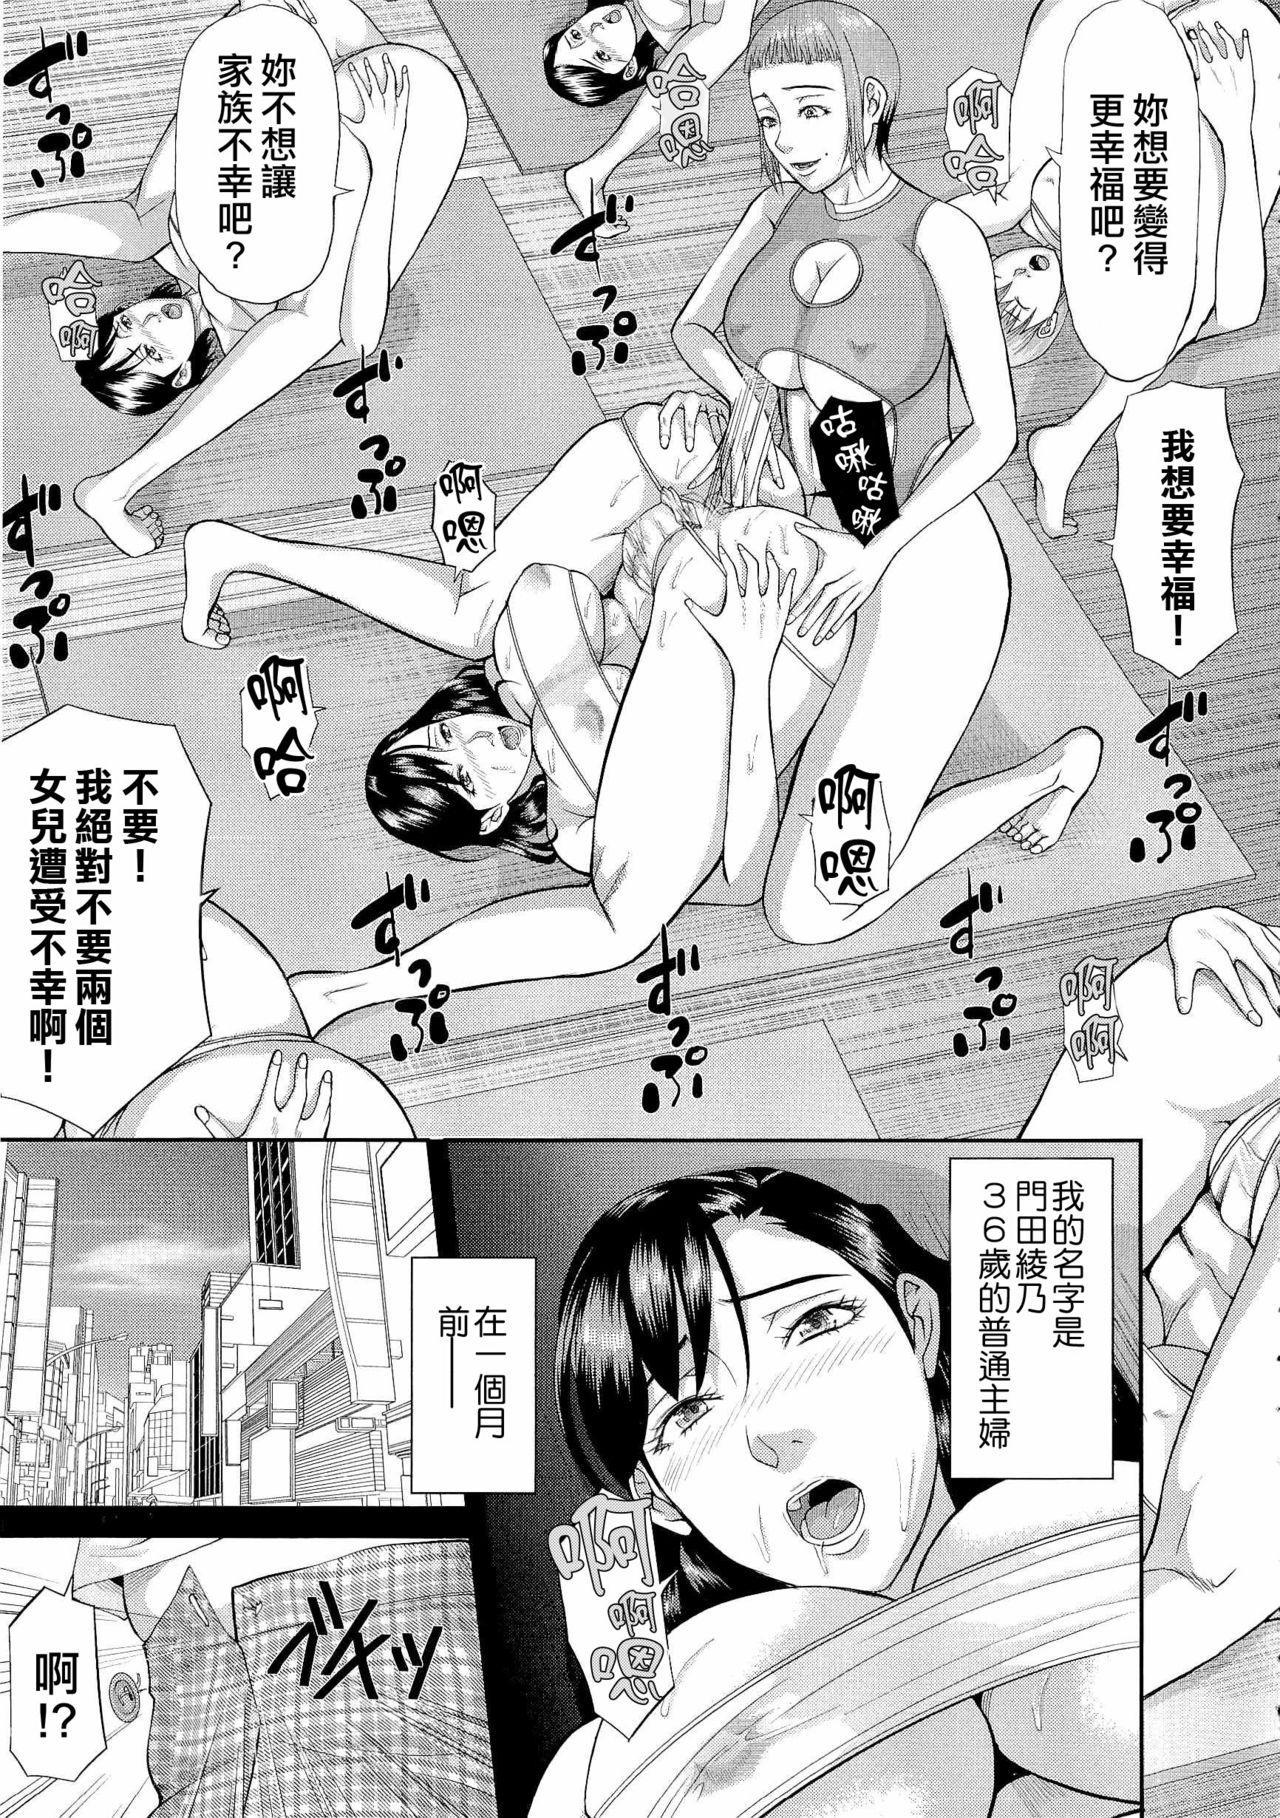 [Honebuto Danshaku] Innou Kaizou Program ~Oyako Zecchou Cult Ochi~ [Chinese]【不想记名重嵌--高质量图源】 10